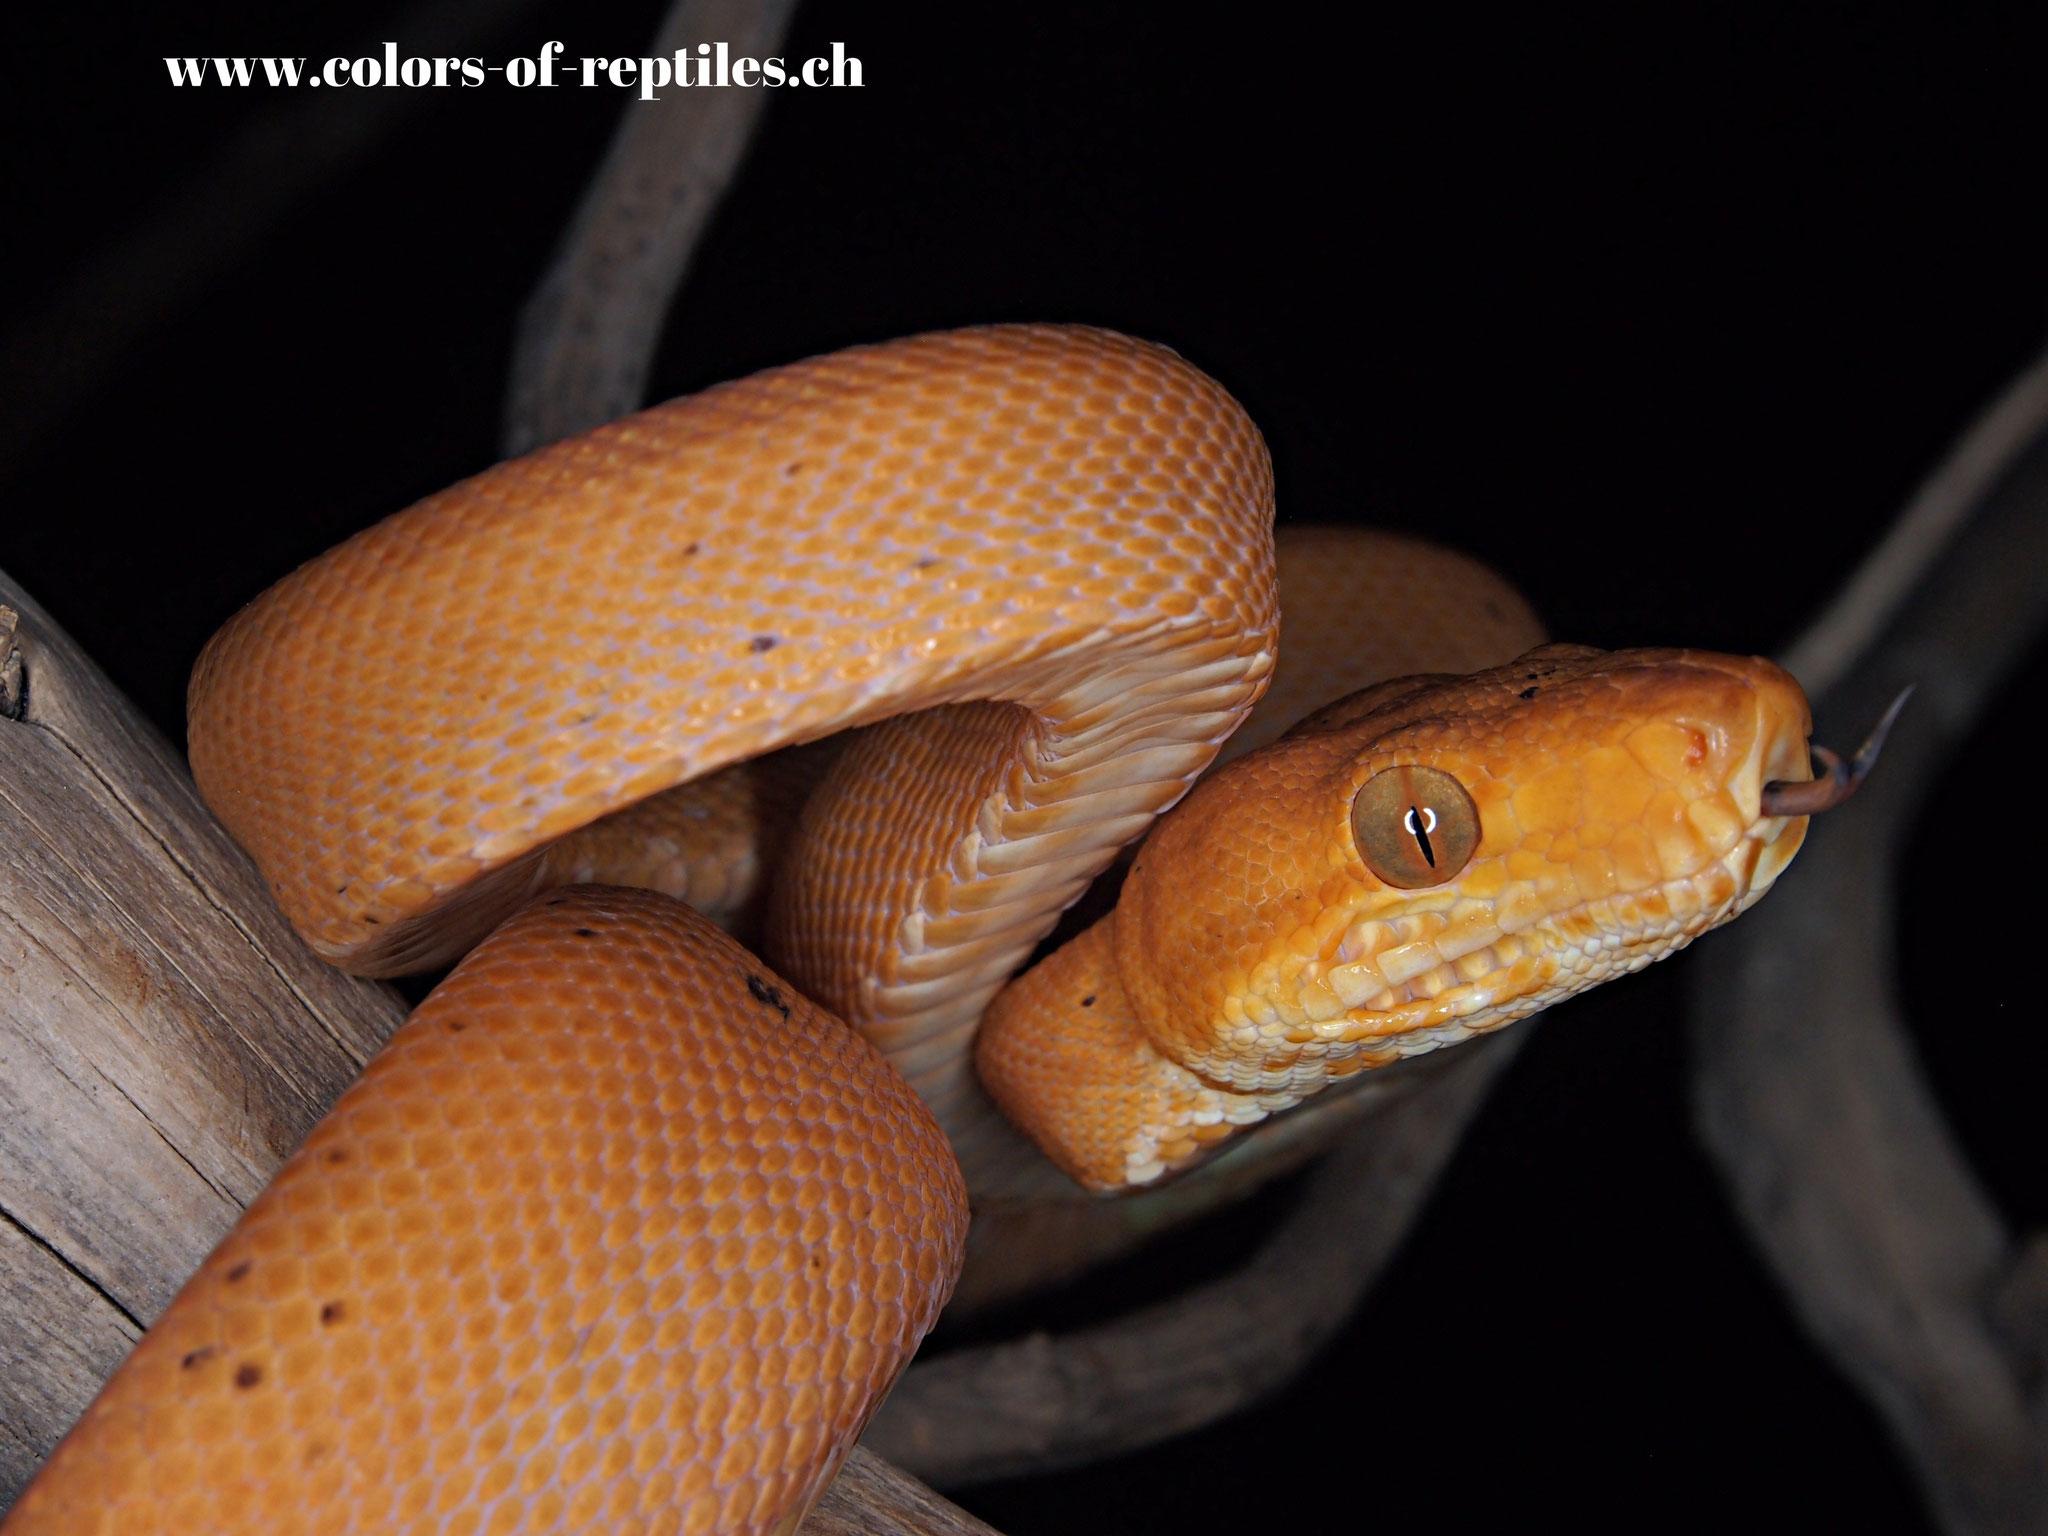 Gartenboa - Corallus hortulanus